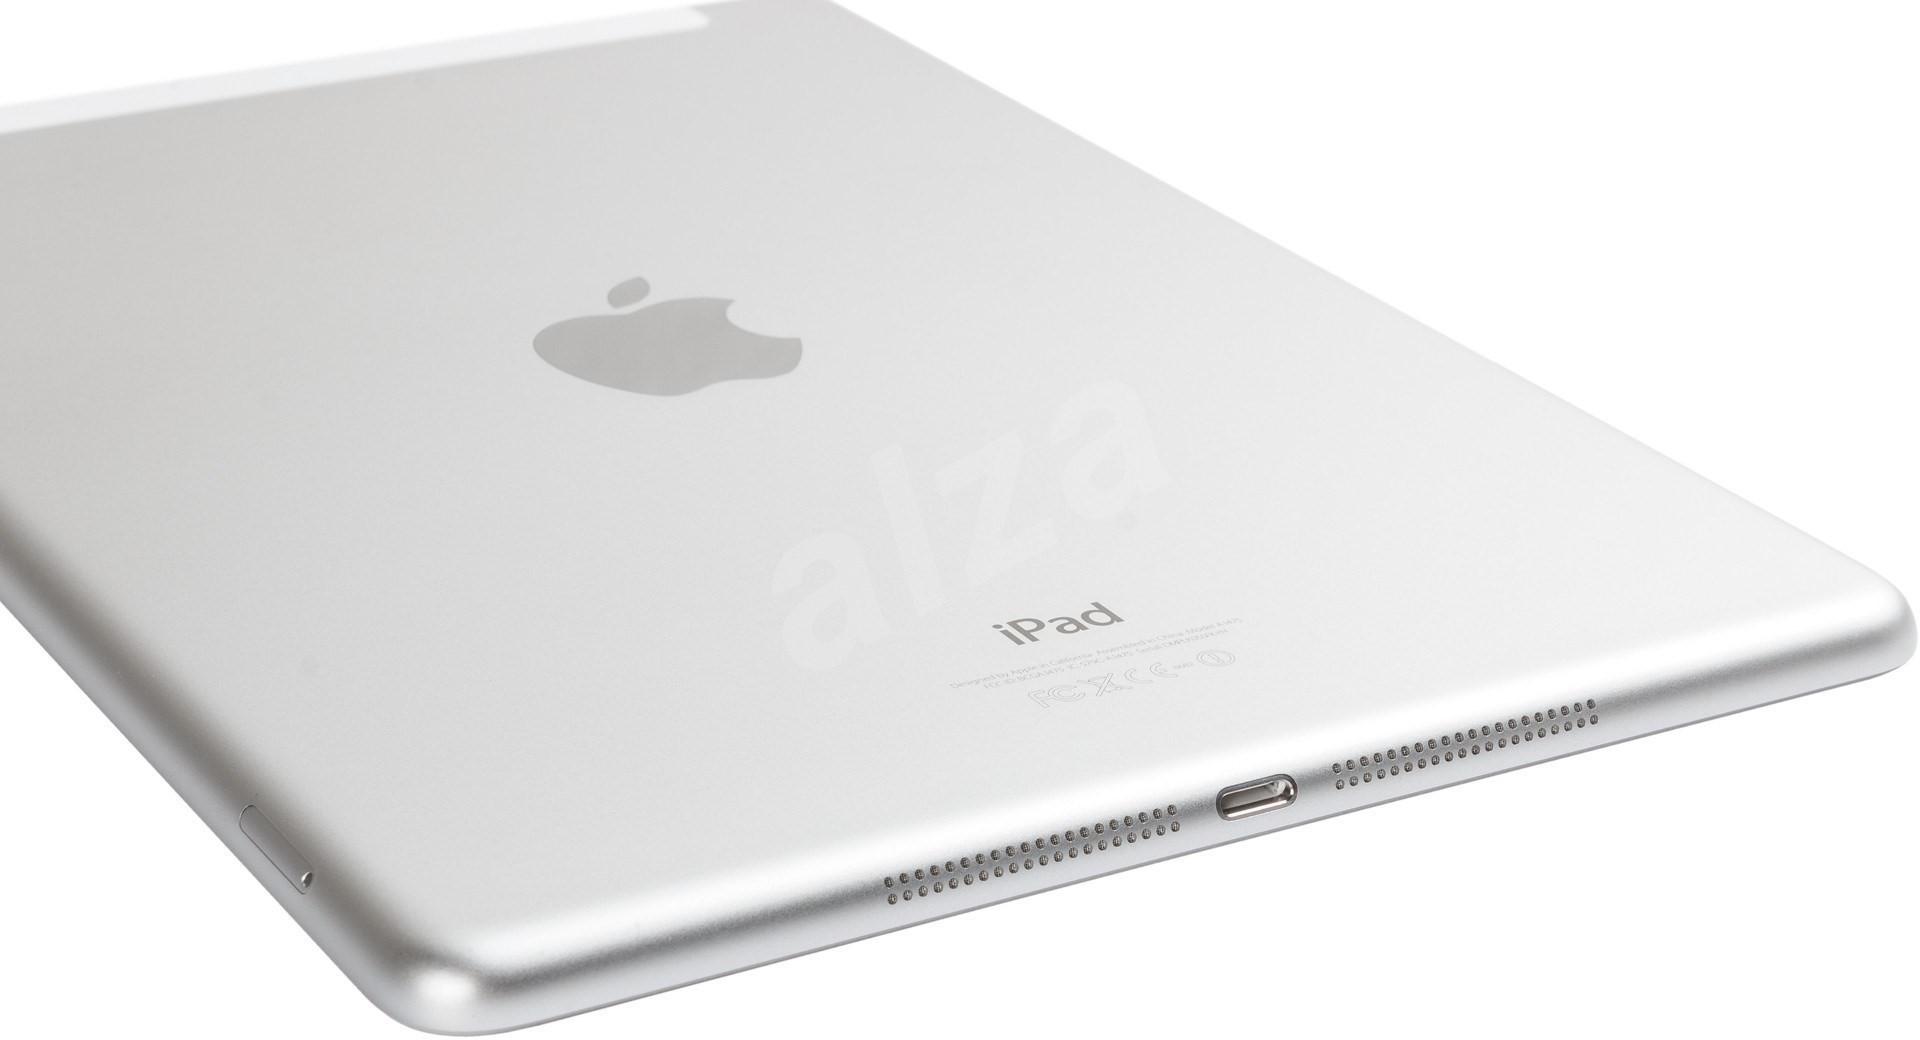 ipad air 32gb wifi silver tablet. Black Bedroom Furniture Sets. Home Design Ideas